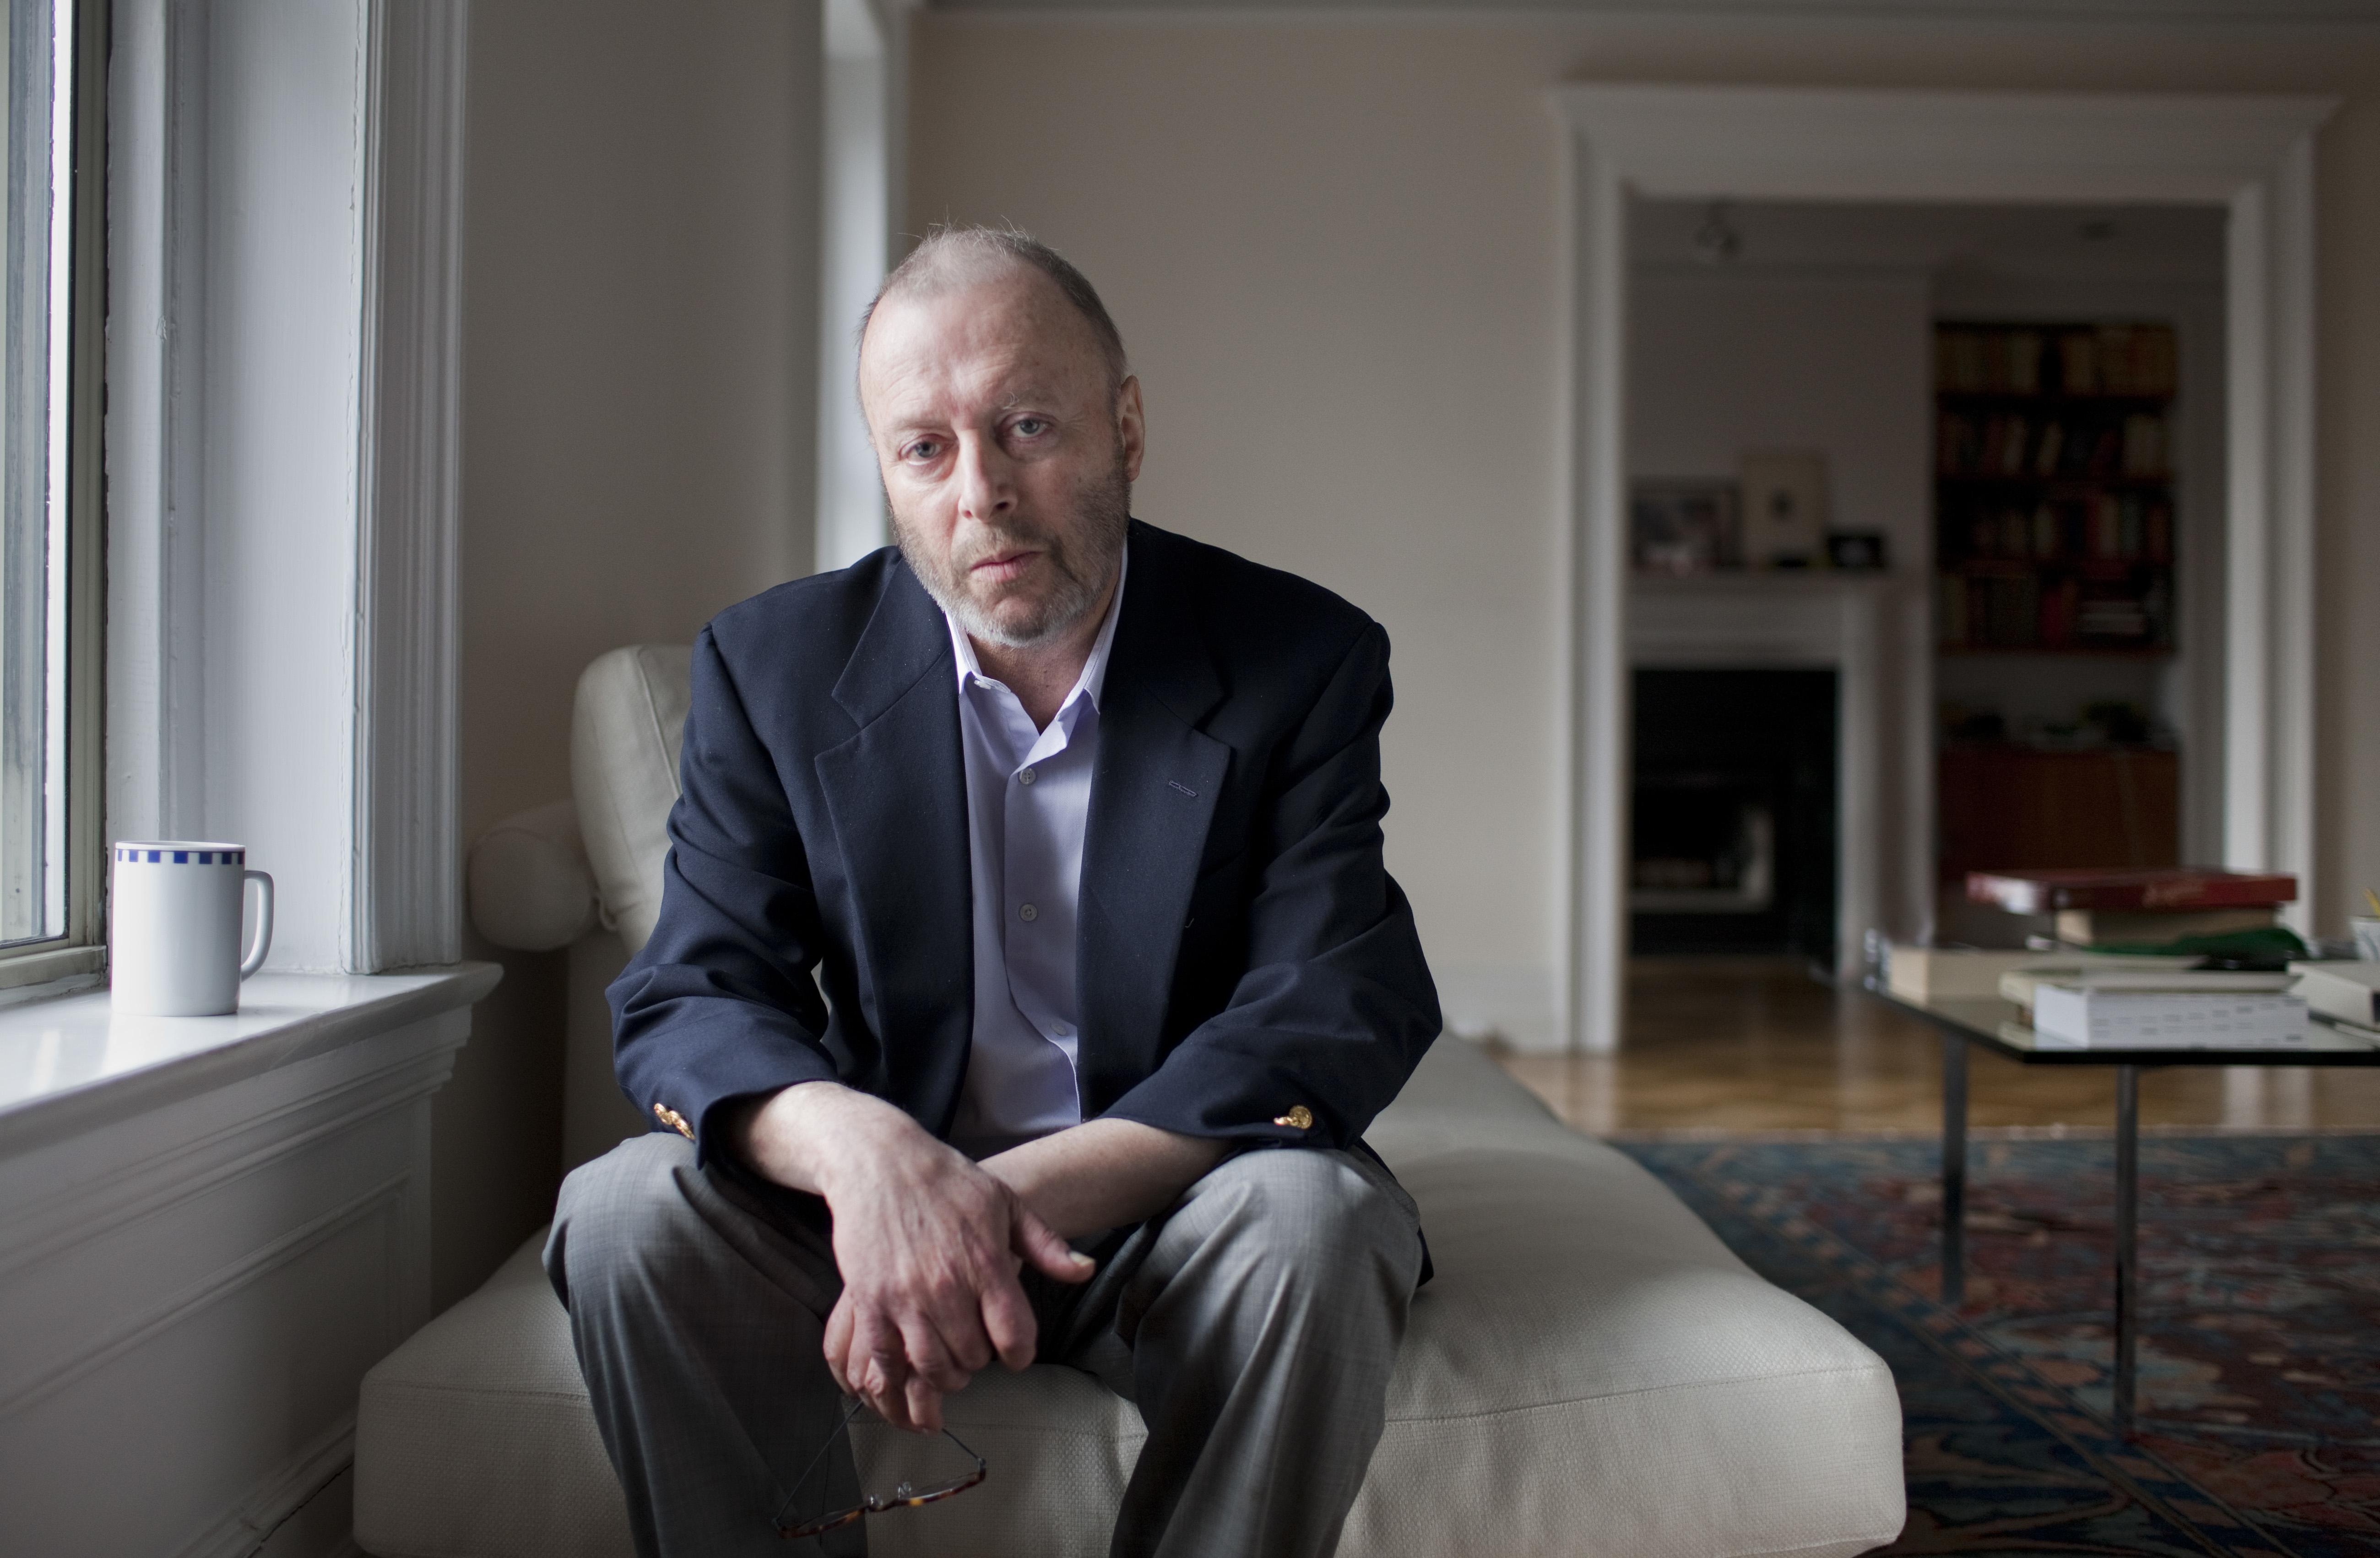 Christopher Hitchens Inspires New Amis Novel